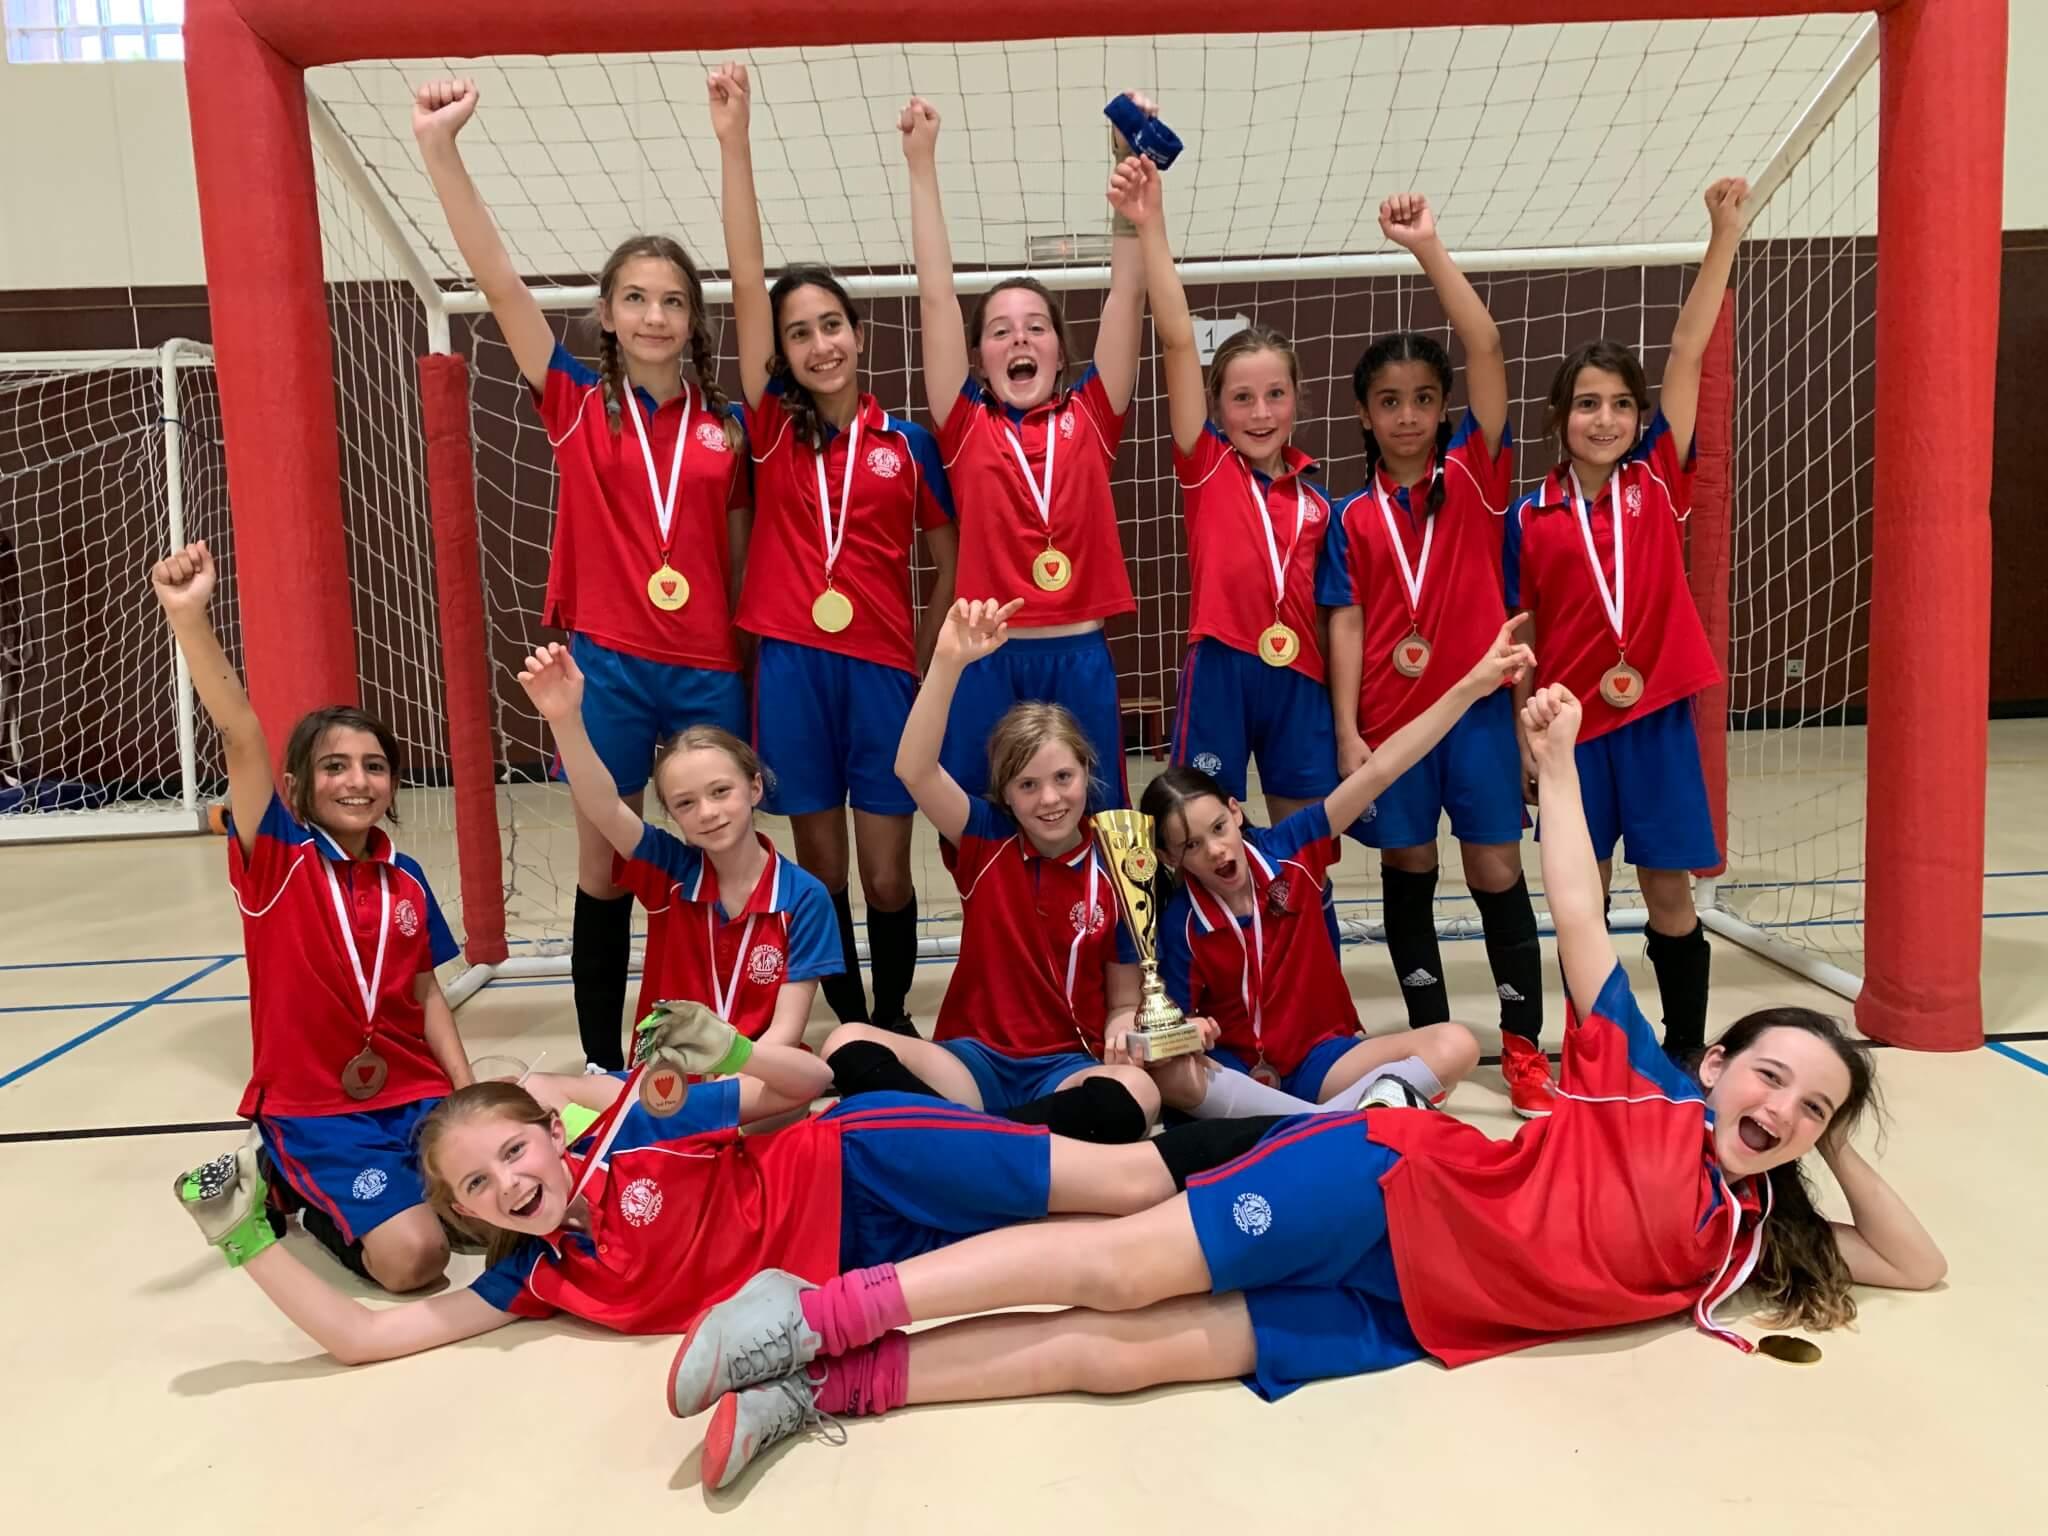 1st _ 3rd Place winners - Rebecca Lambert